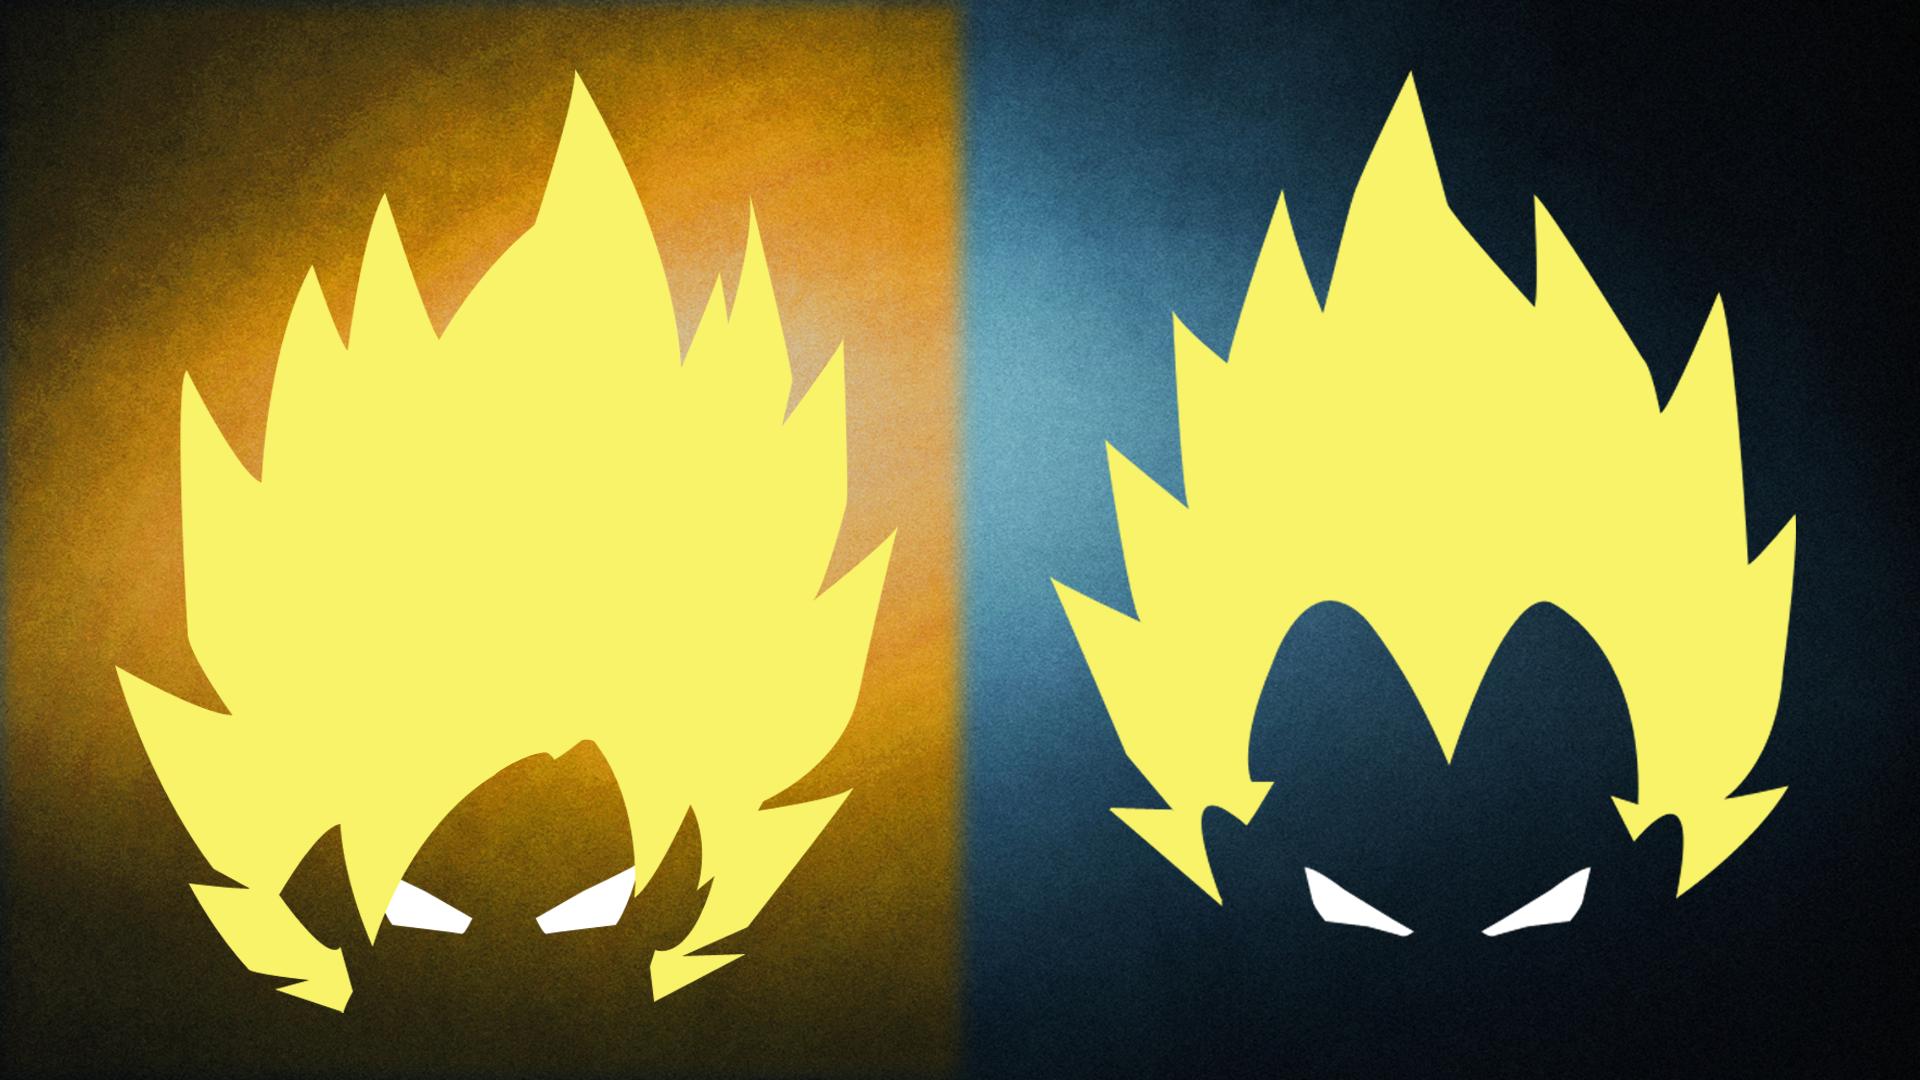 Oc First Ever Attempt At Minimalist Art Goku And Vegeta Dbz Art Minimalist Art Goku Wallpaper